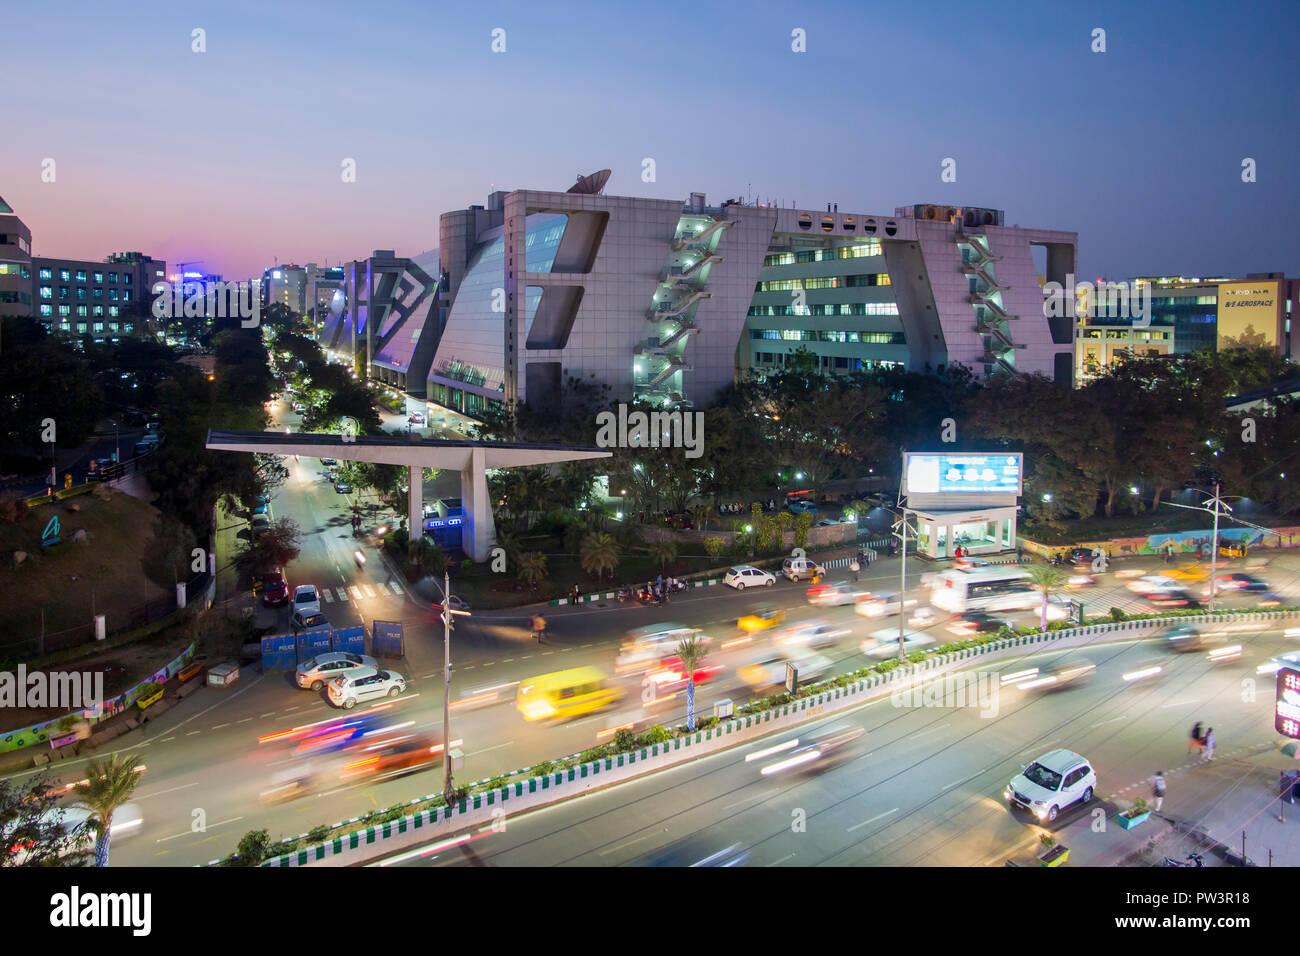 India, Hyderabad, capital of Telangana State, (Andhra Pradesh), Hi Tech City, India's IT centre Stock Photo